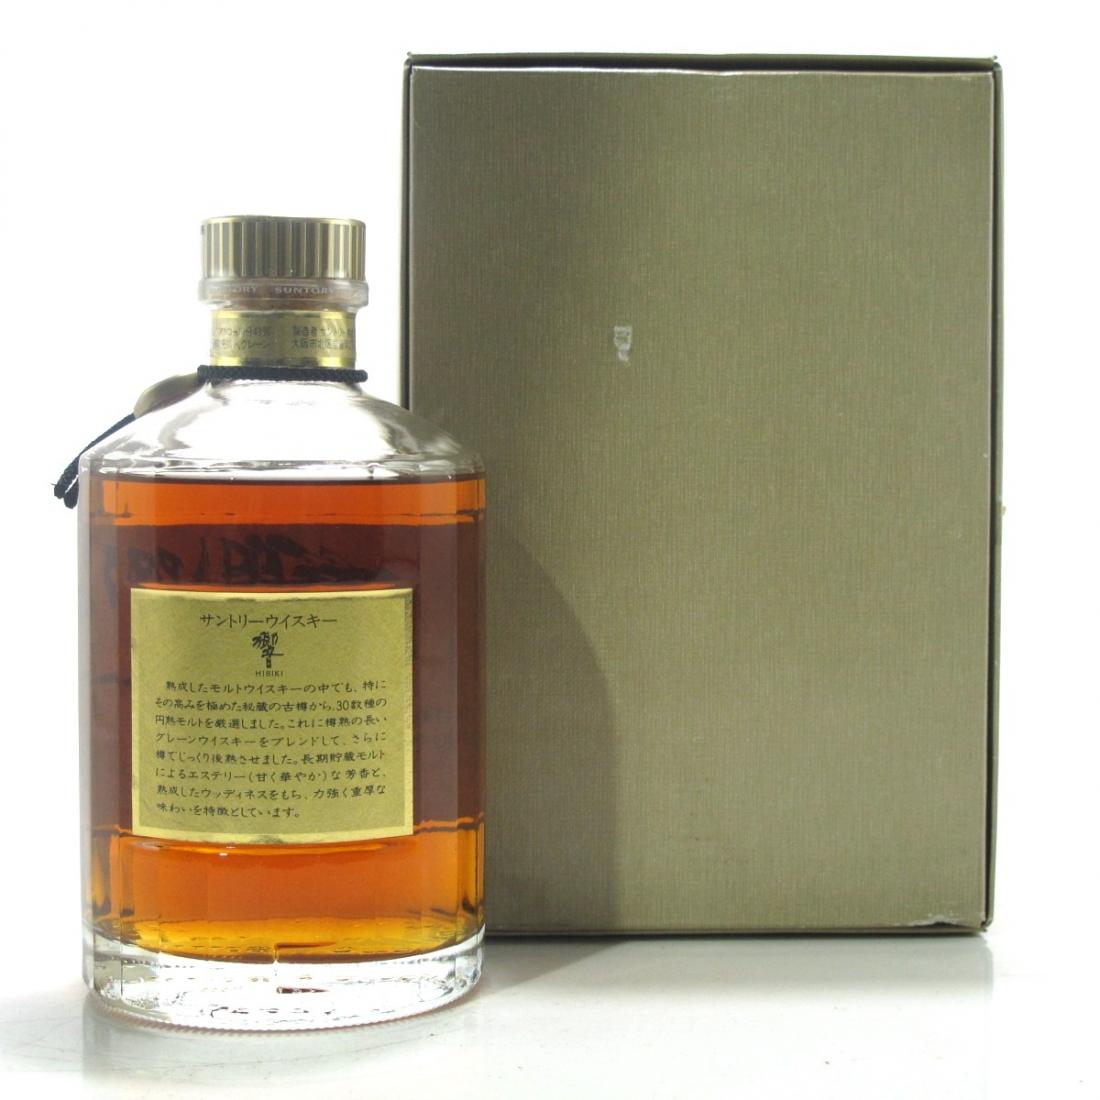 Hibiki / Suntory Whisky 1990s 75cl